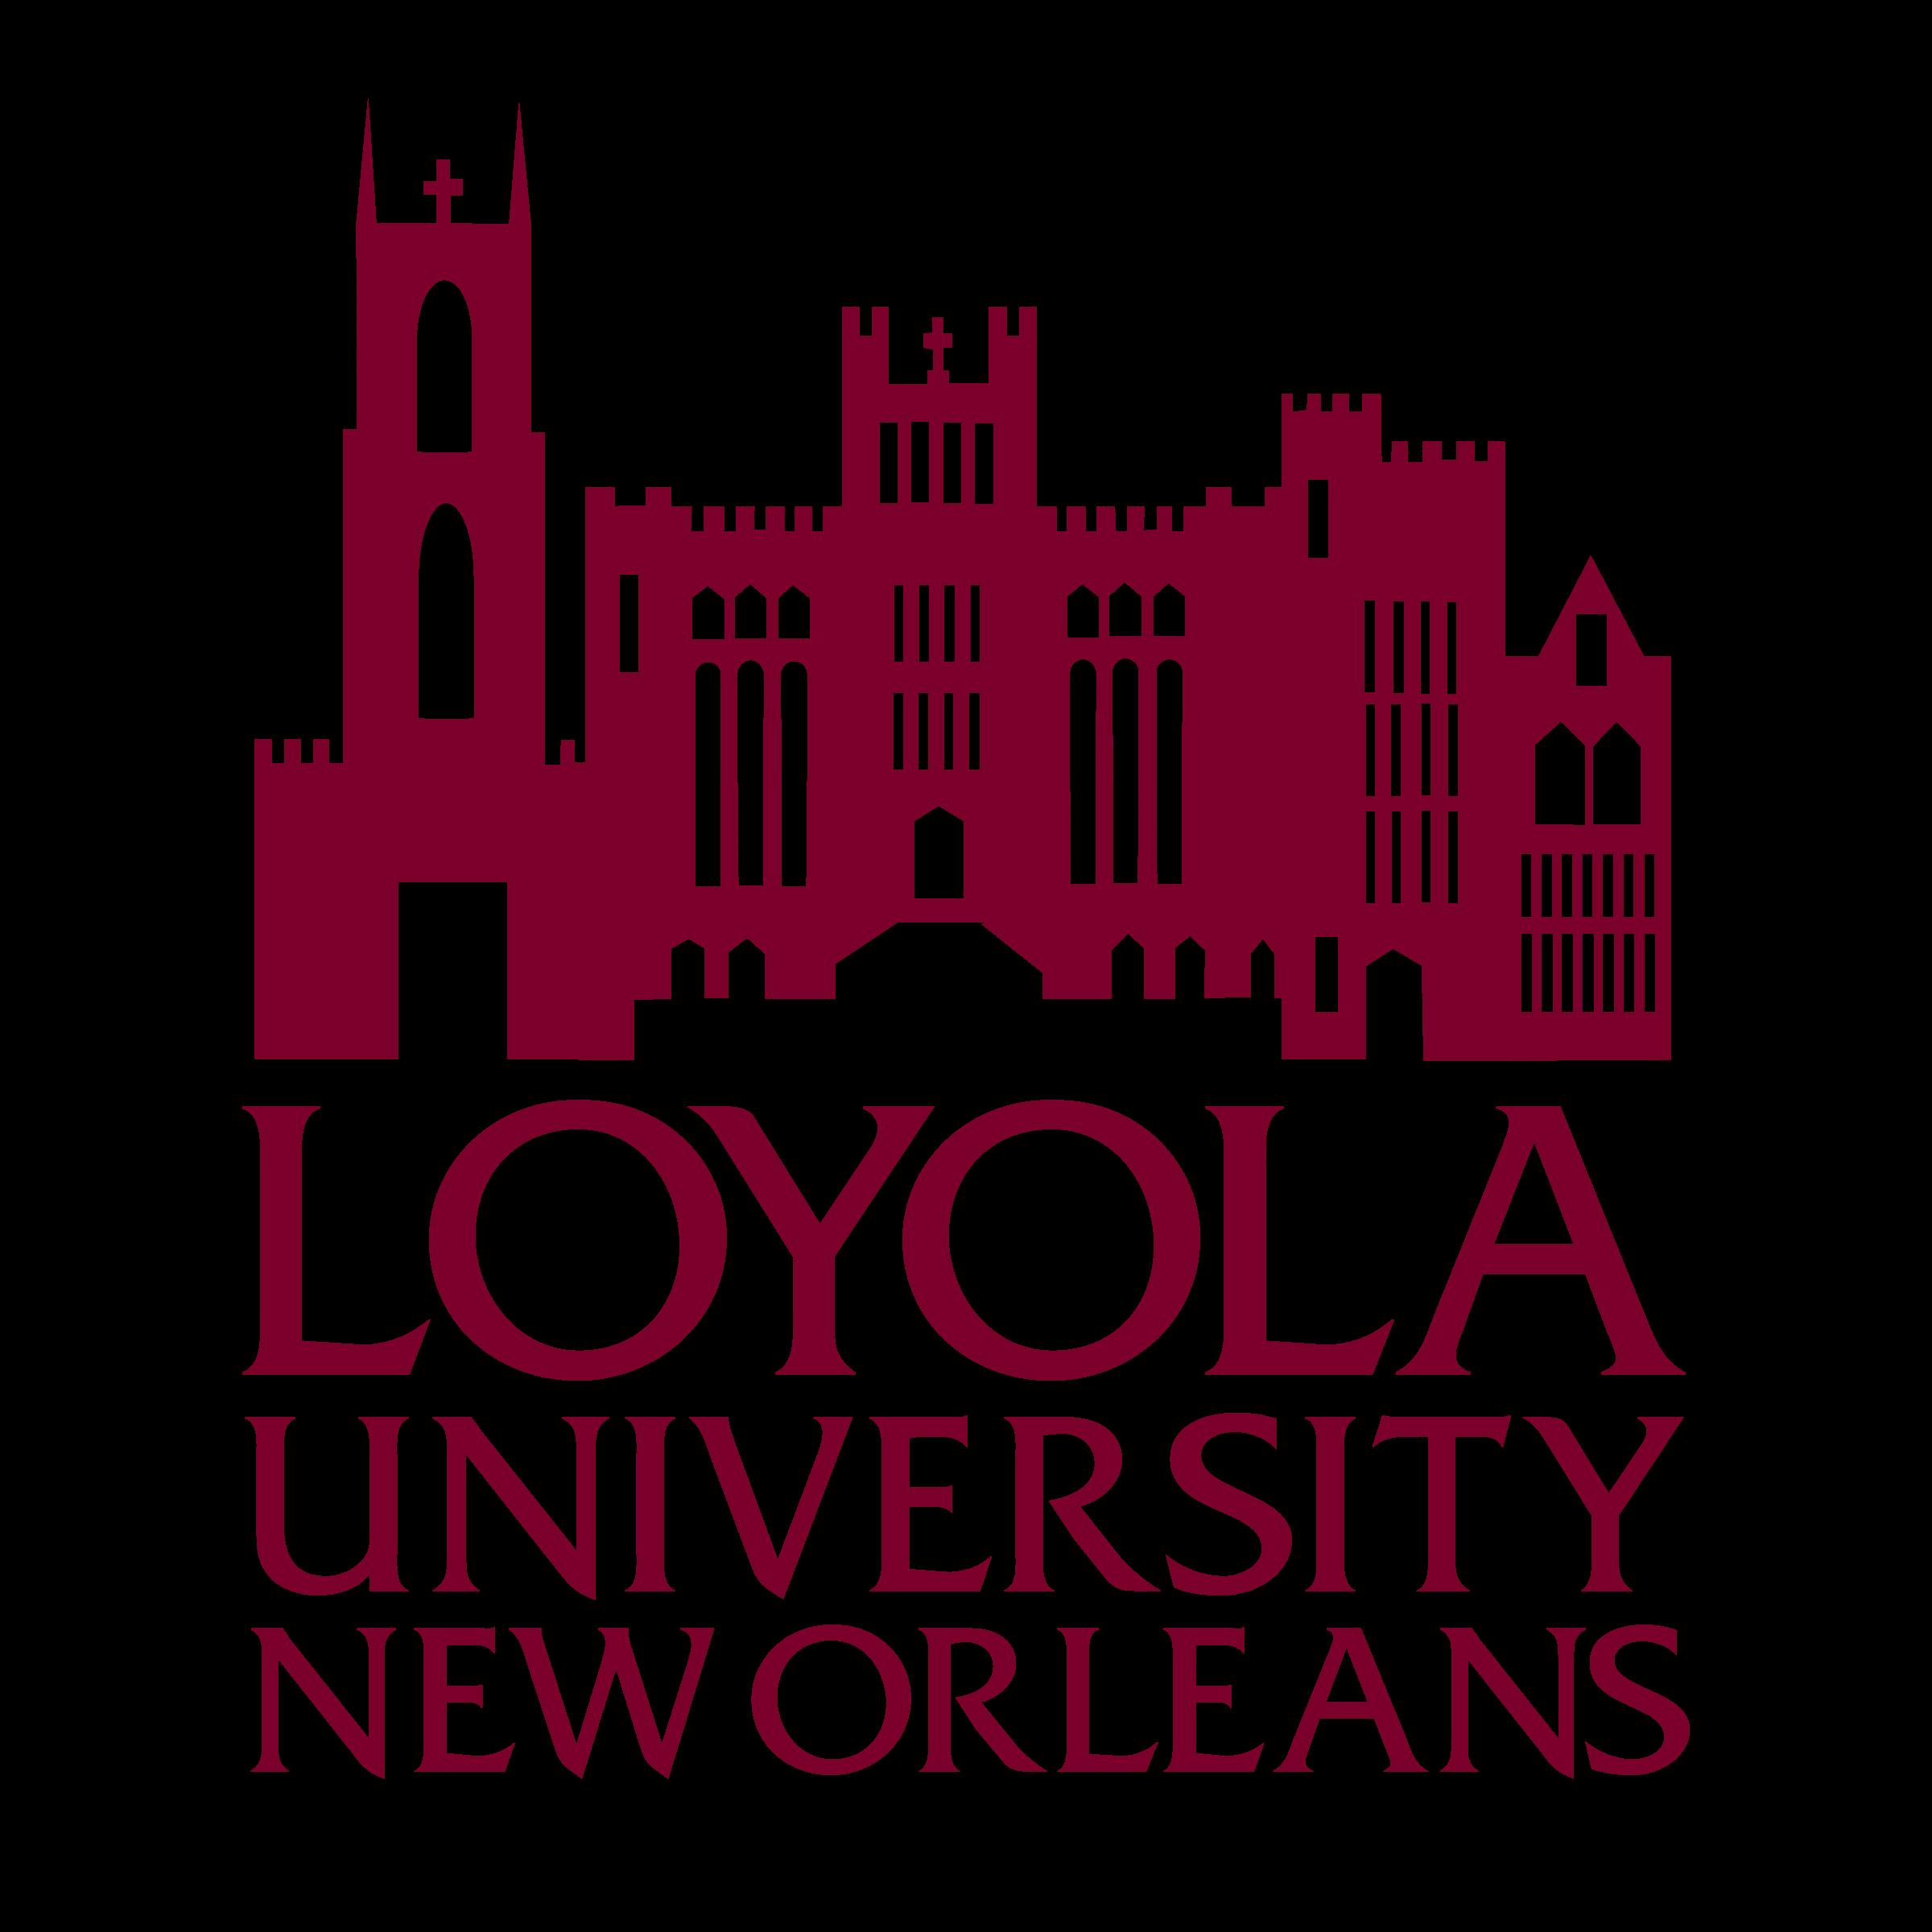 loyola-university-new-orleans-1-logo-png-transparent.png